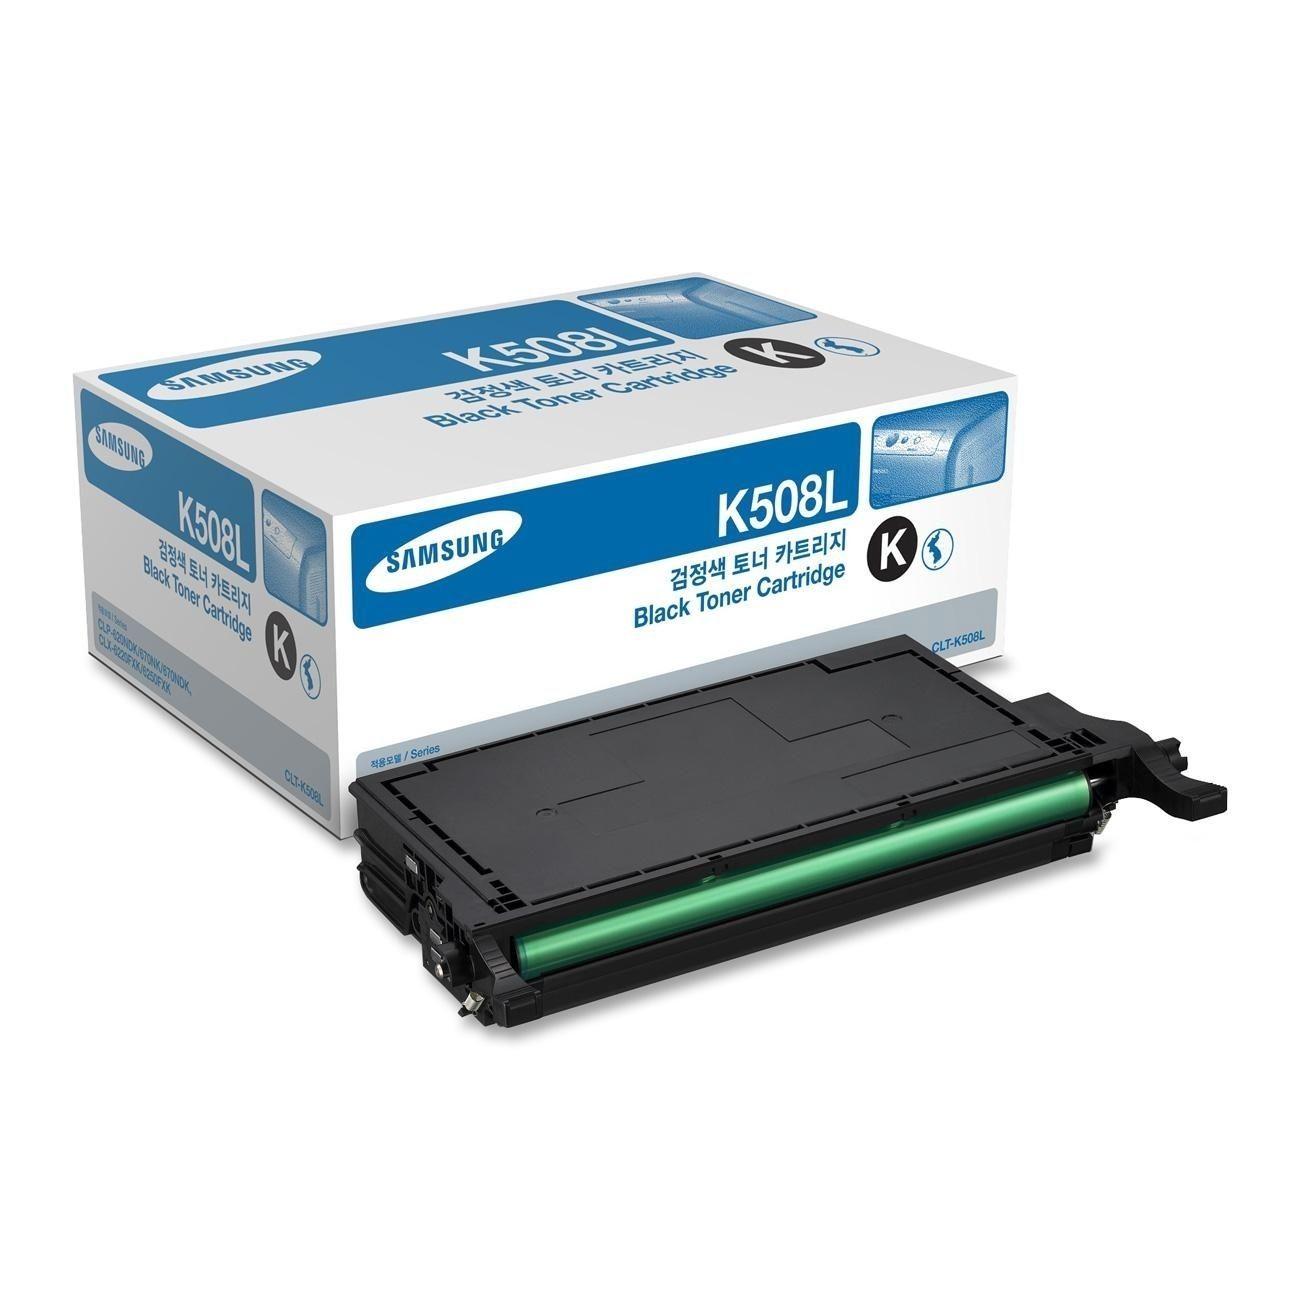 NEW Genuine Samsung MLT-D203E 203E Extra High Yield Black Toner Cartridge OEM